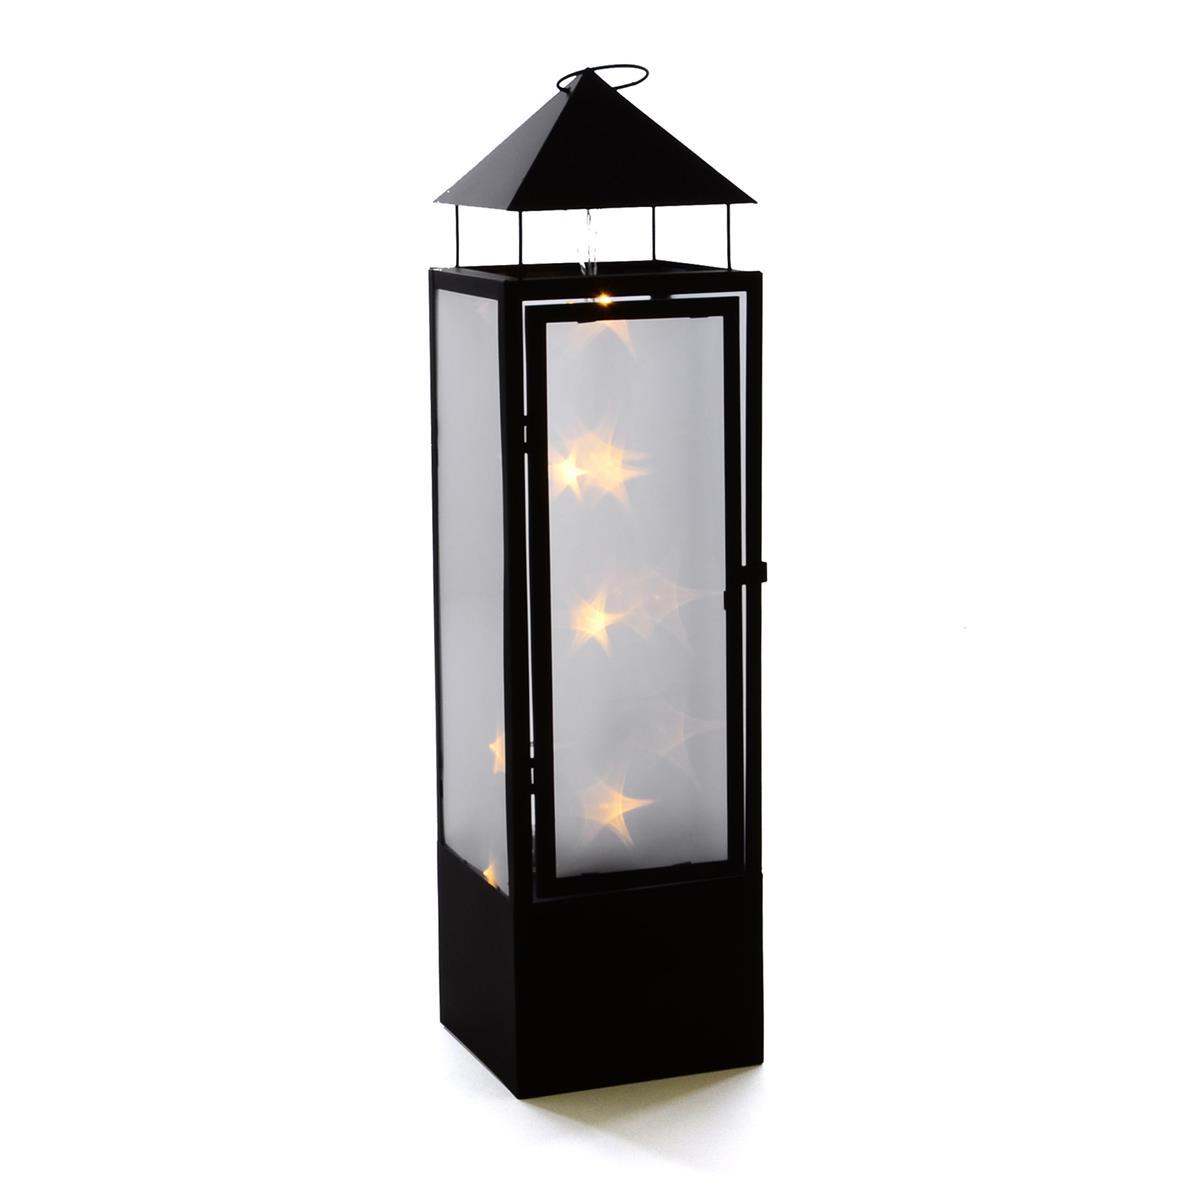 20 LED Laterne Holografie 3D Effekt 70 cm Batterie Windlicht Leuchte Timer außen